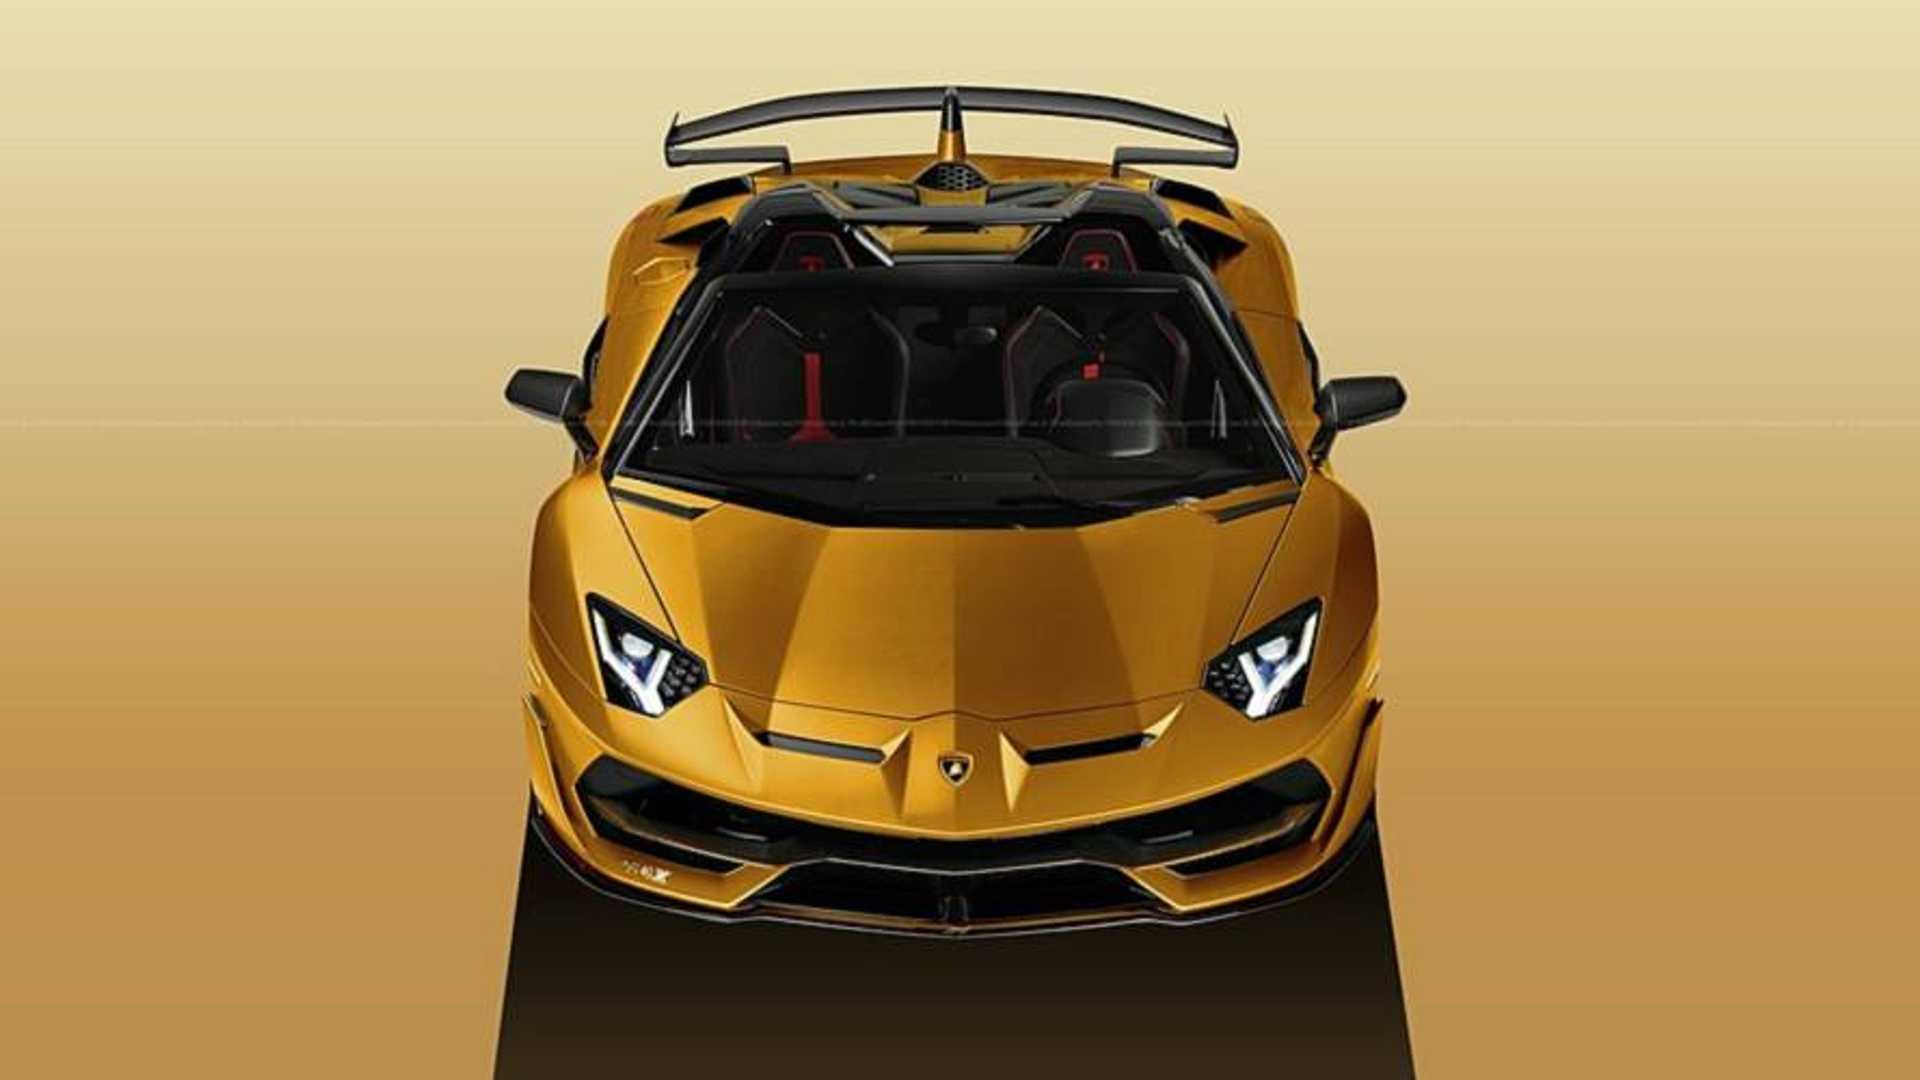 Lamborghini Aventador SVJ Roadster Basically Confirmed